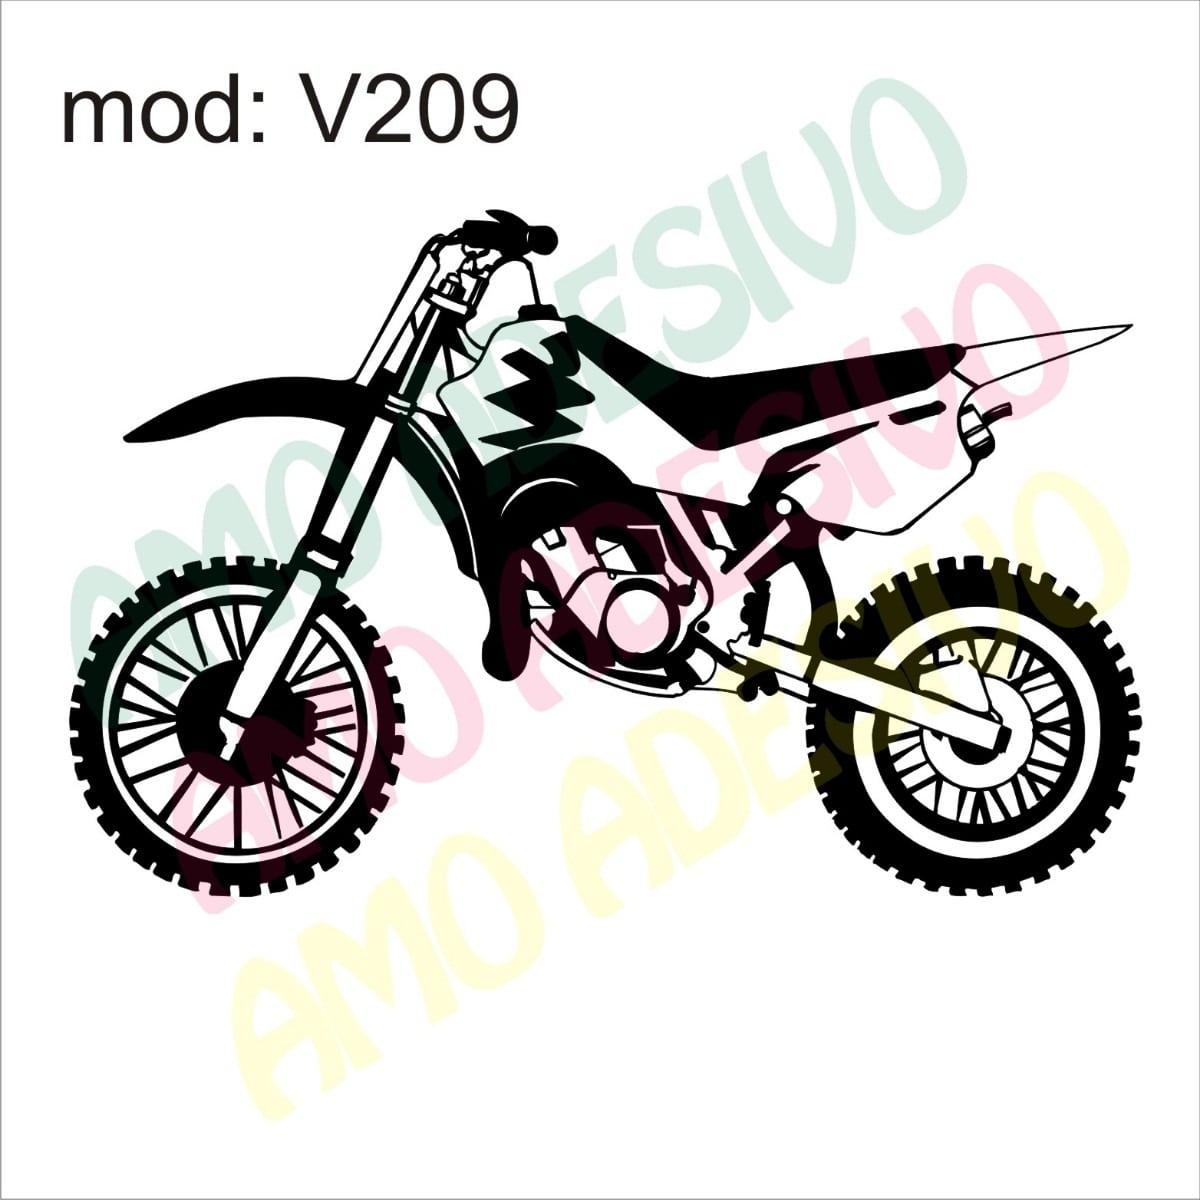 Adesivo V209 Moto Xt Desenho Abstrato Decorativo De Parede